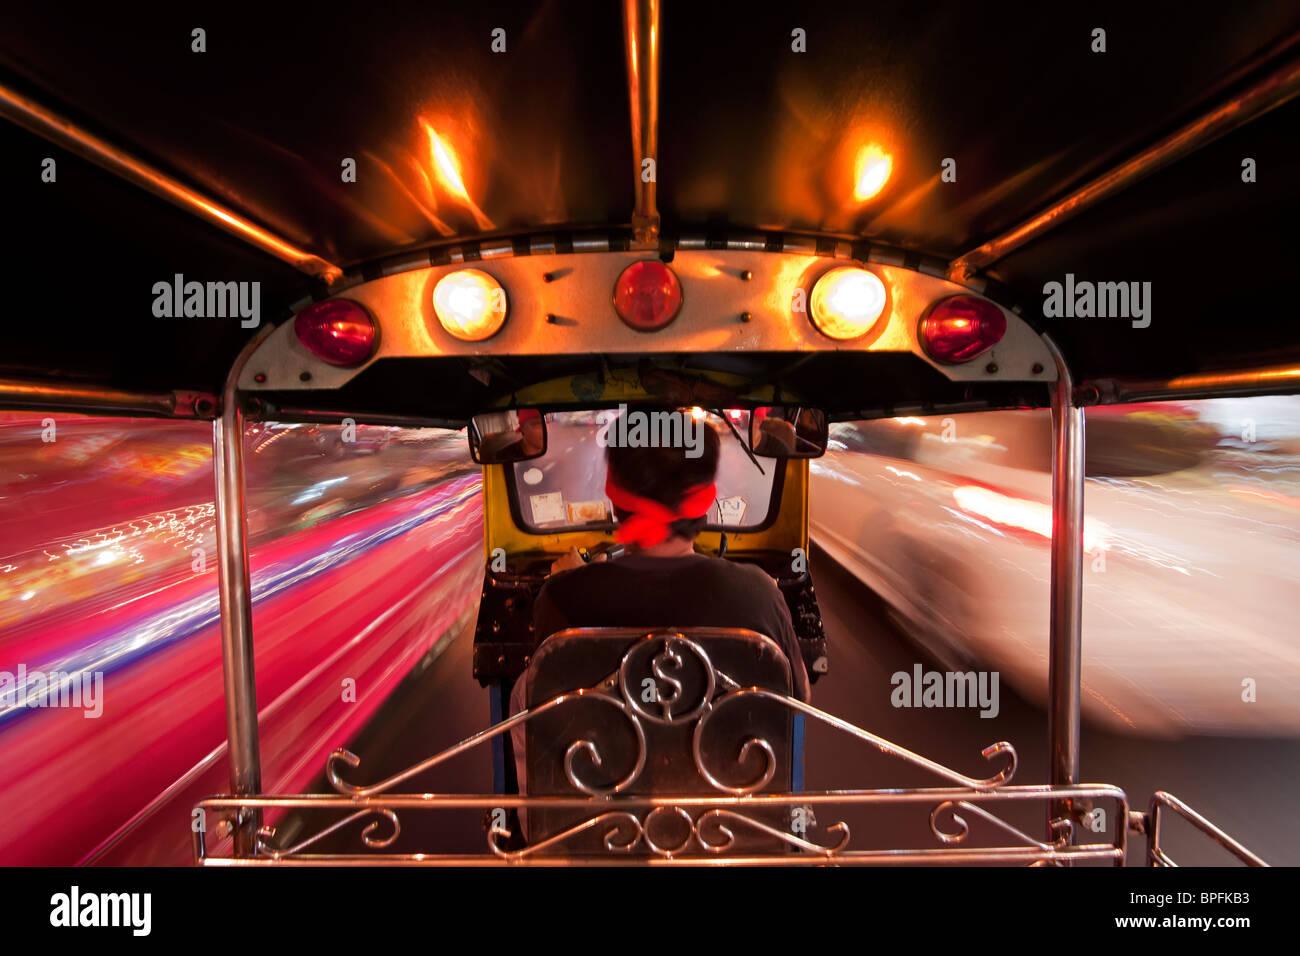 Tuk Tuk or auto rickshaw in motion at night, Bangkok, Thailand, Southeast Asia - Stock Image